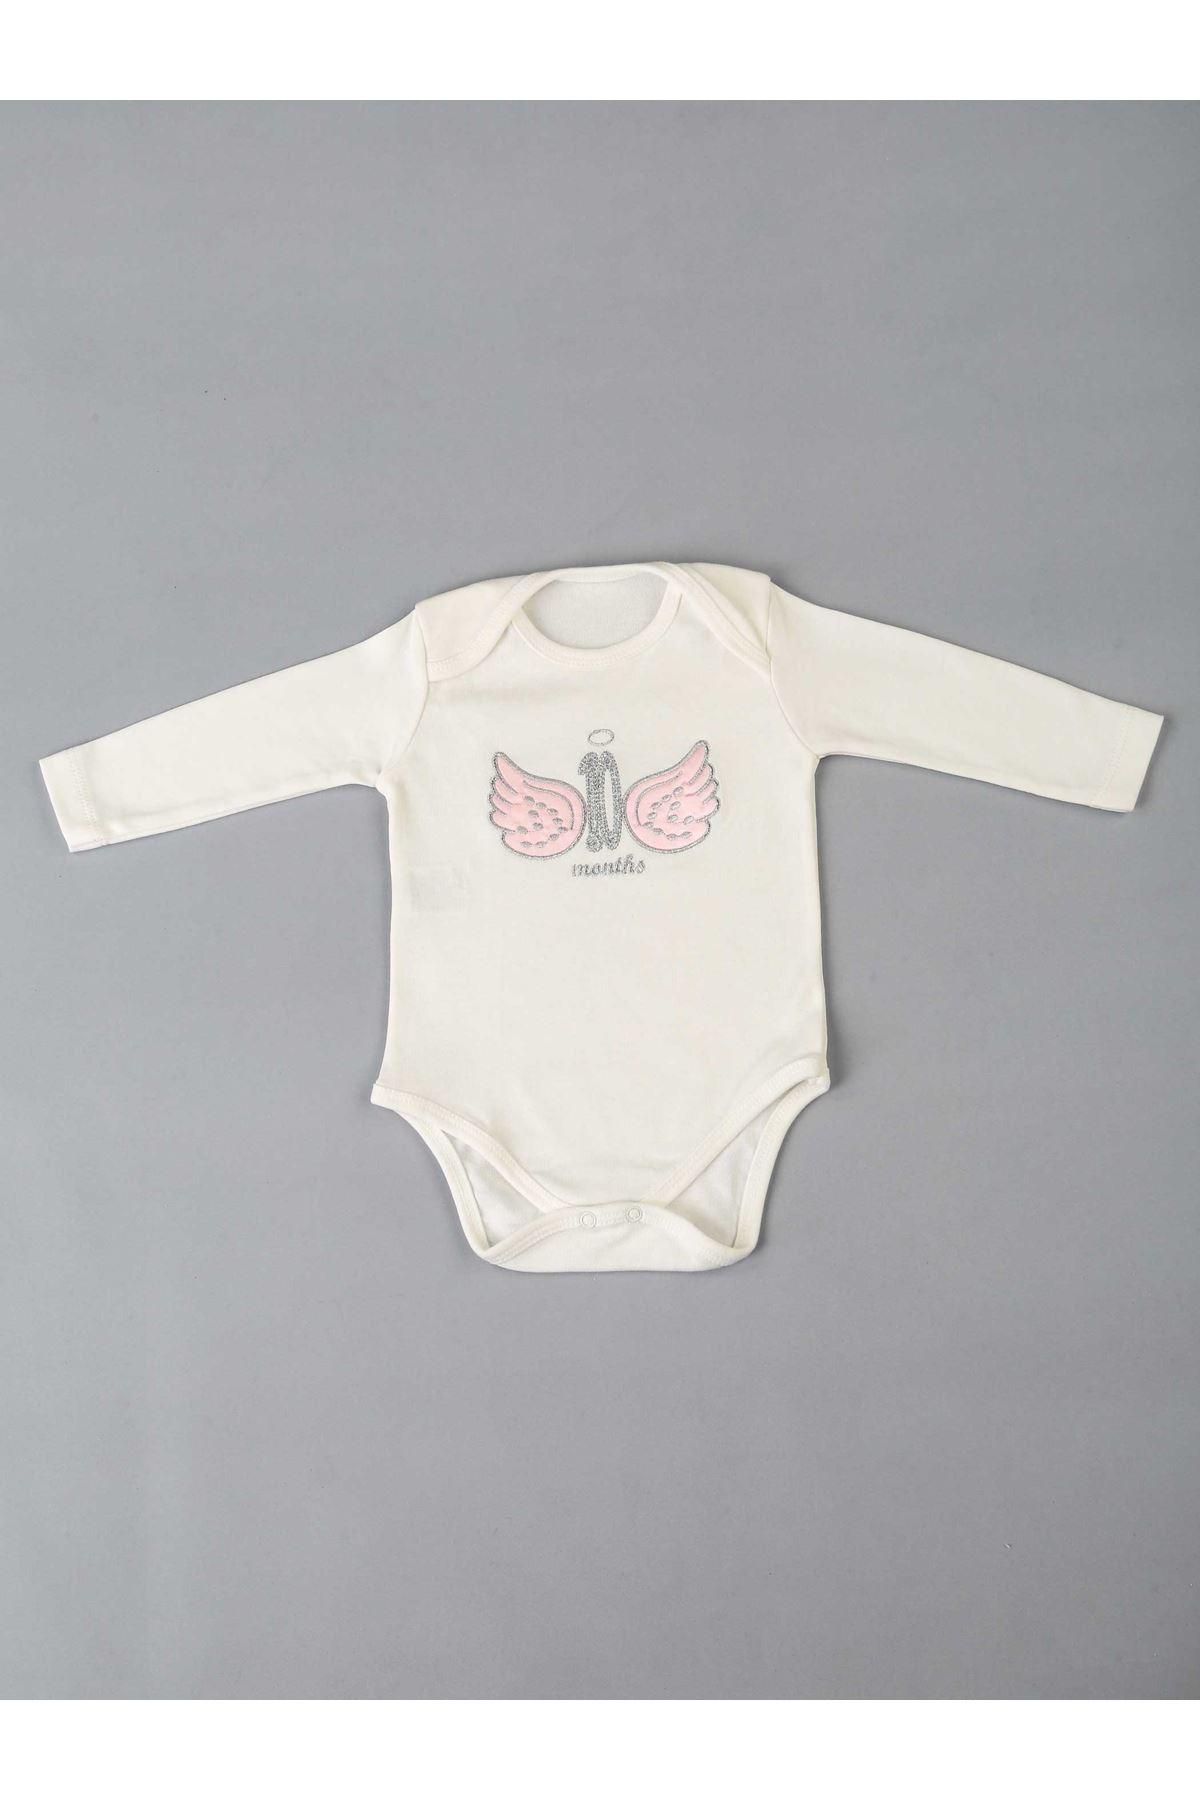 Pembe 12 Aya Özel Kız Bebek Badi